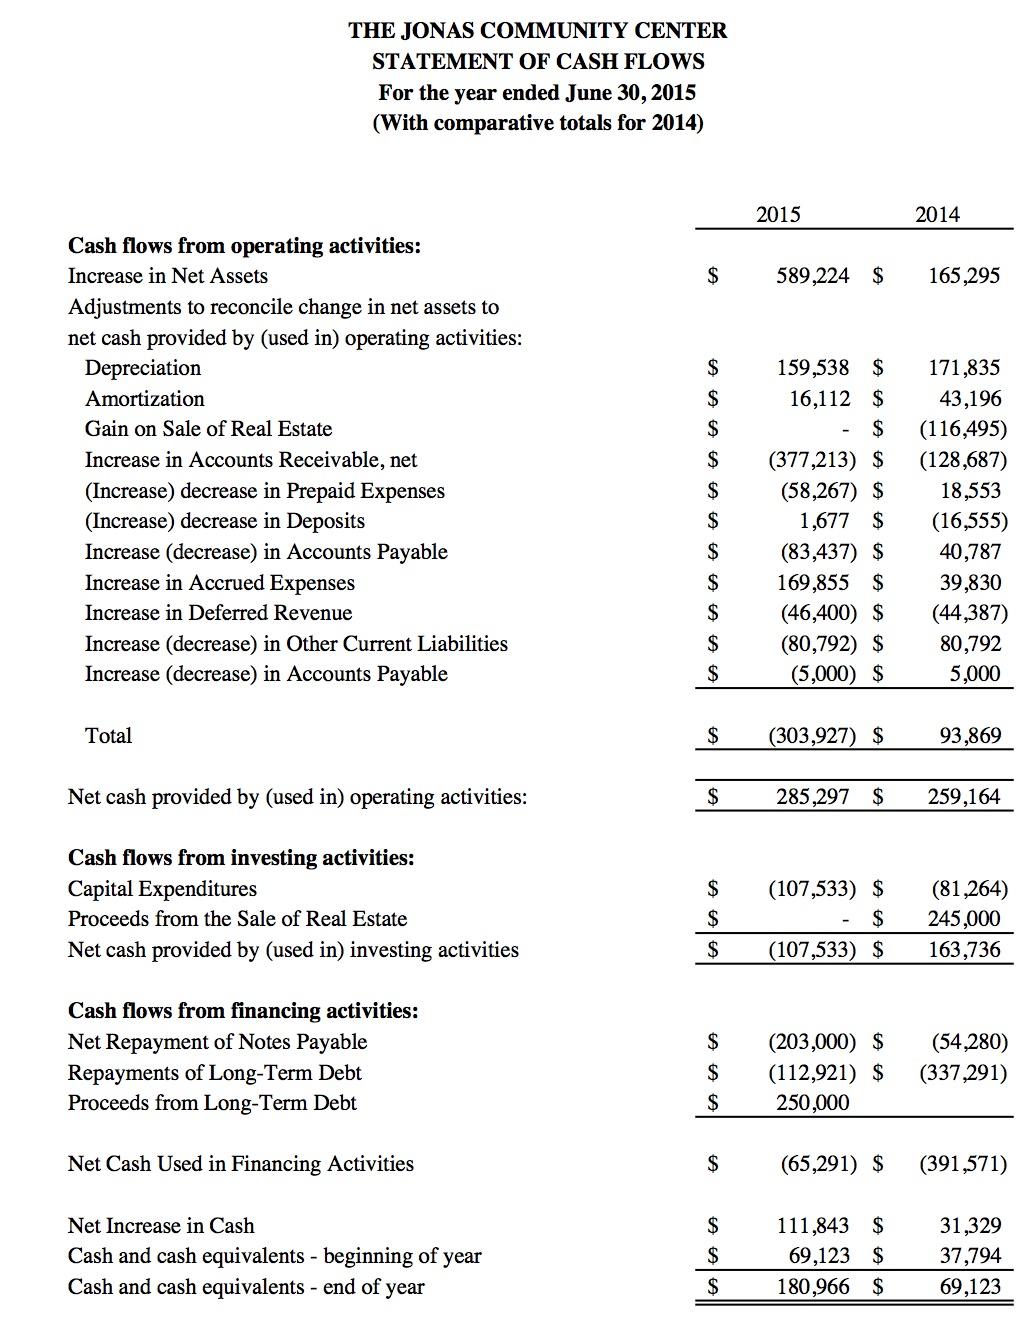 the-jonas-community-center-cash-flow-statement